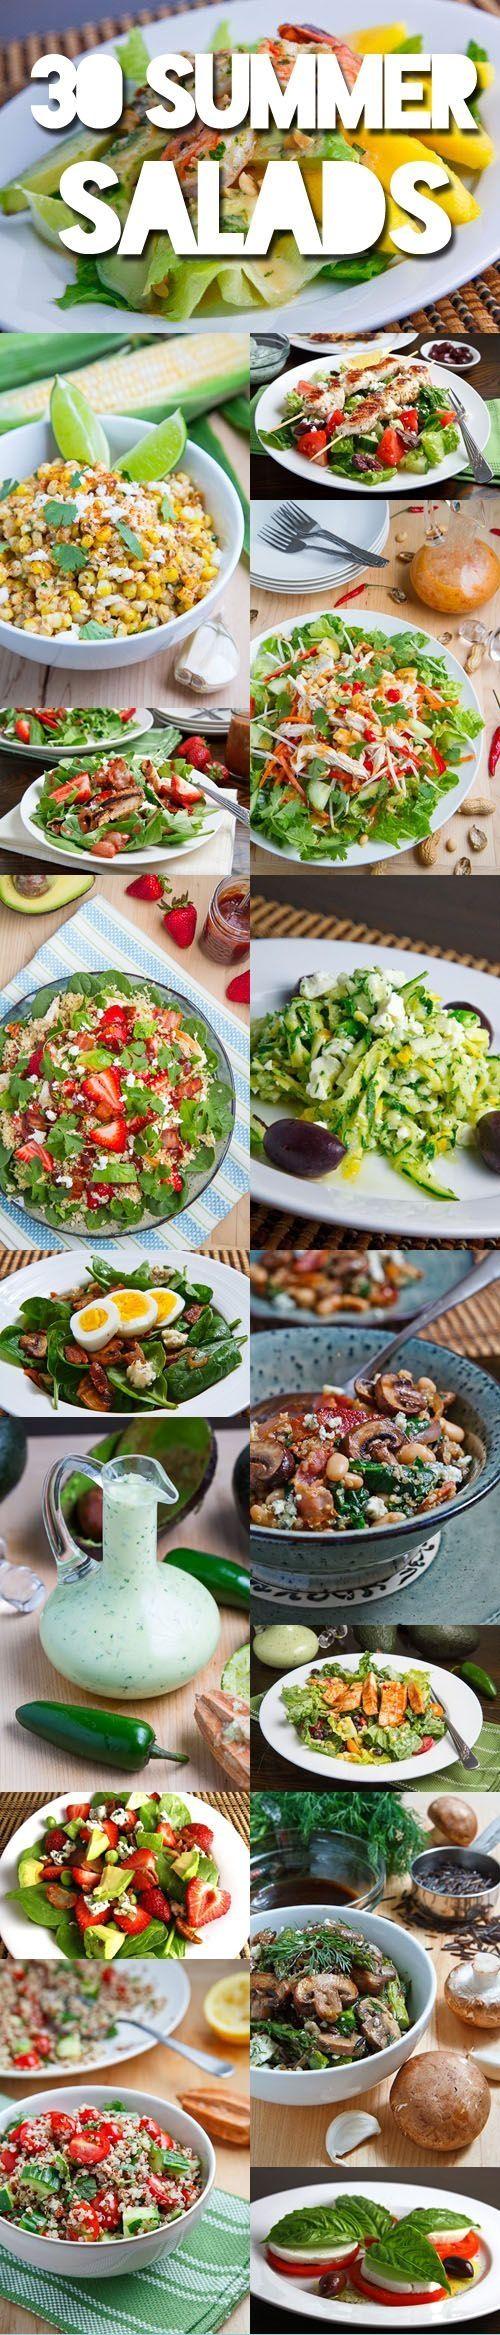 30 Summer Salads | #Salads #Summer